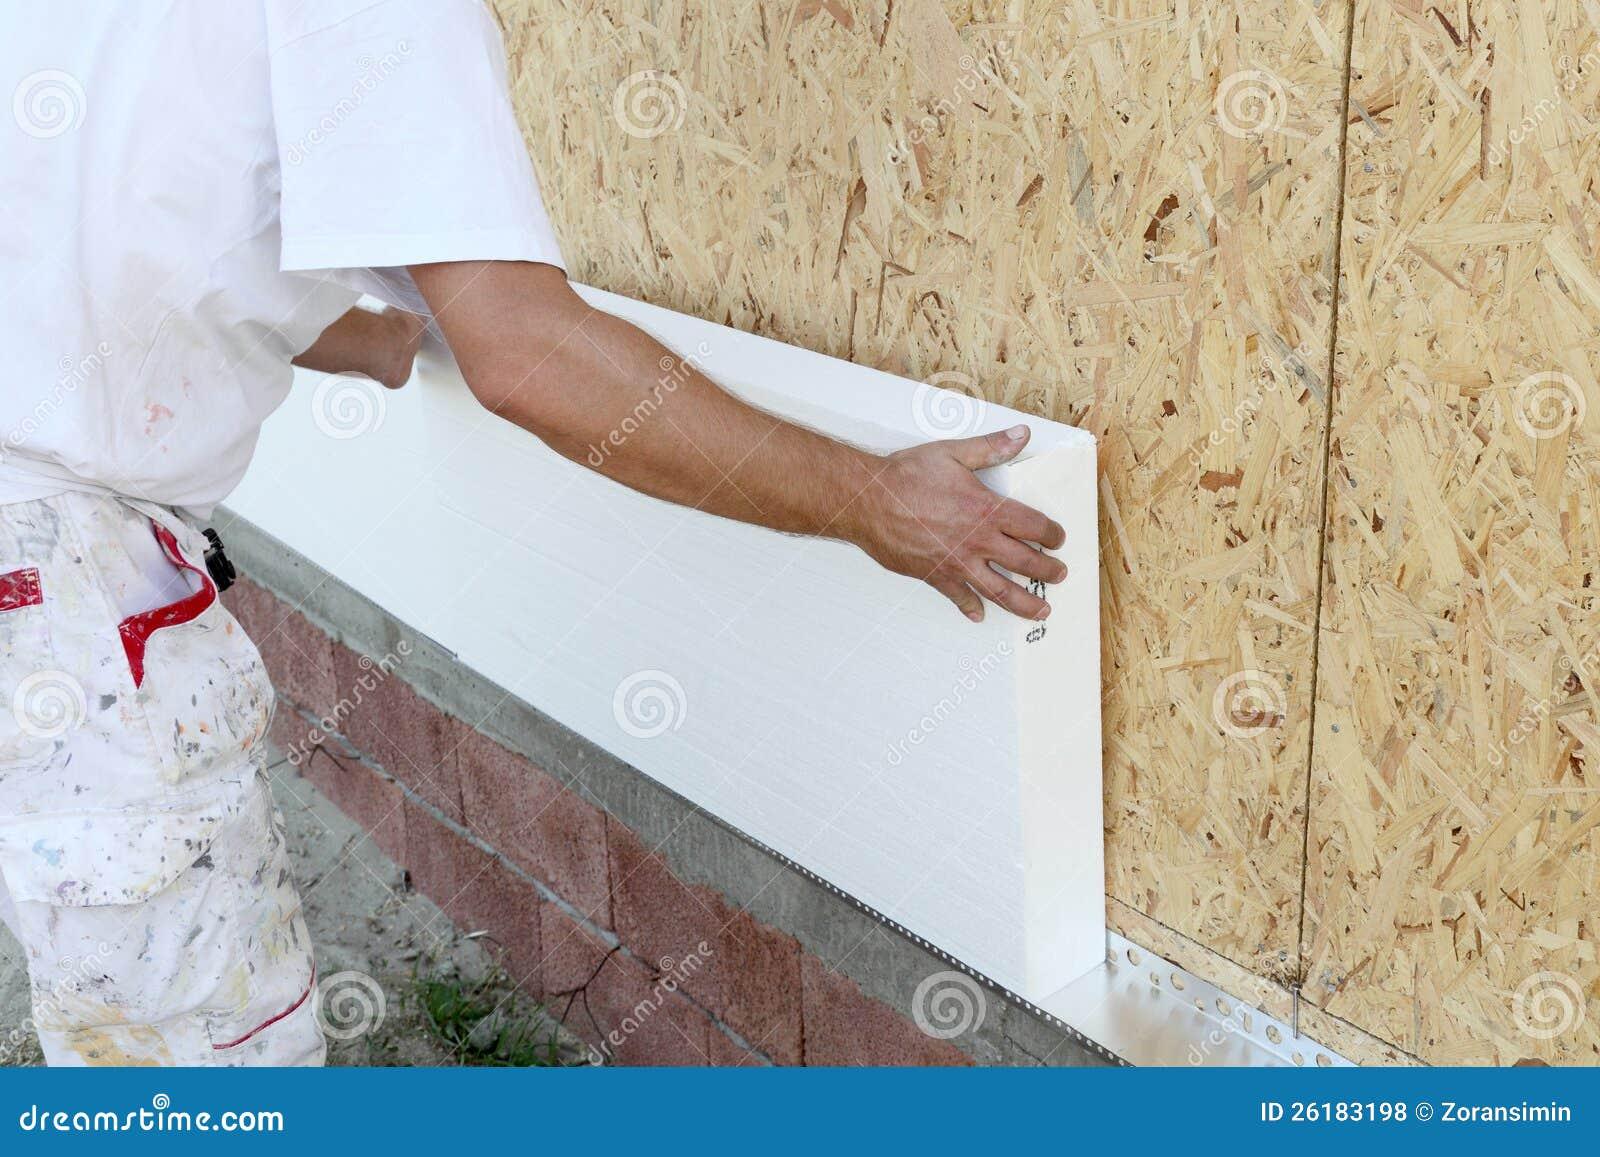 Free business plan insulation